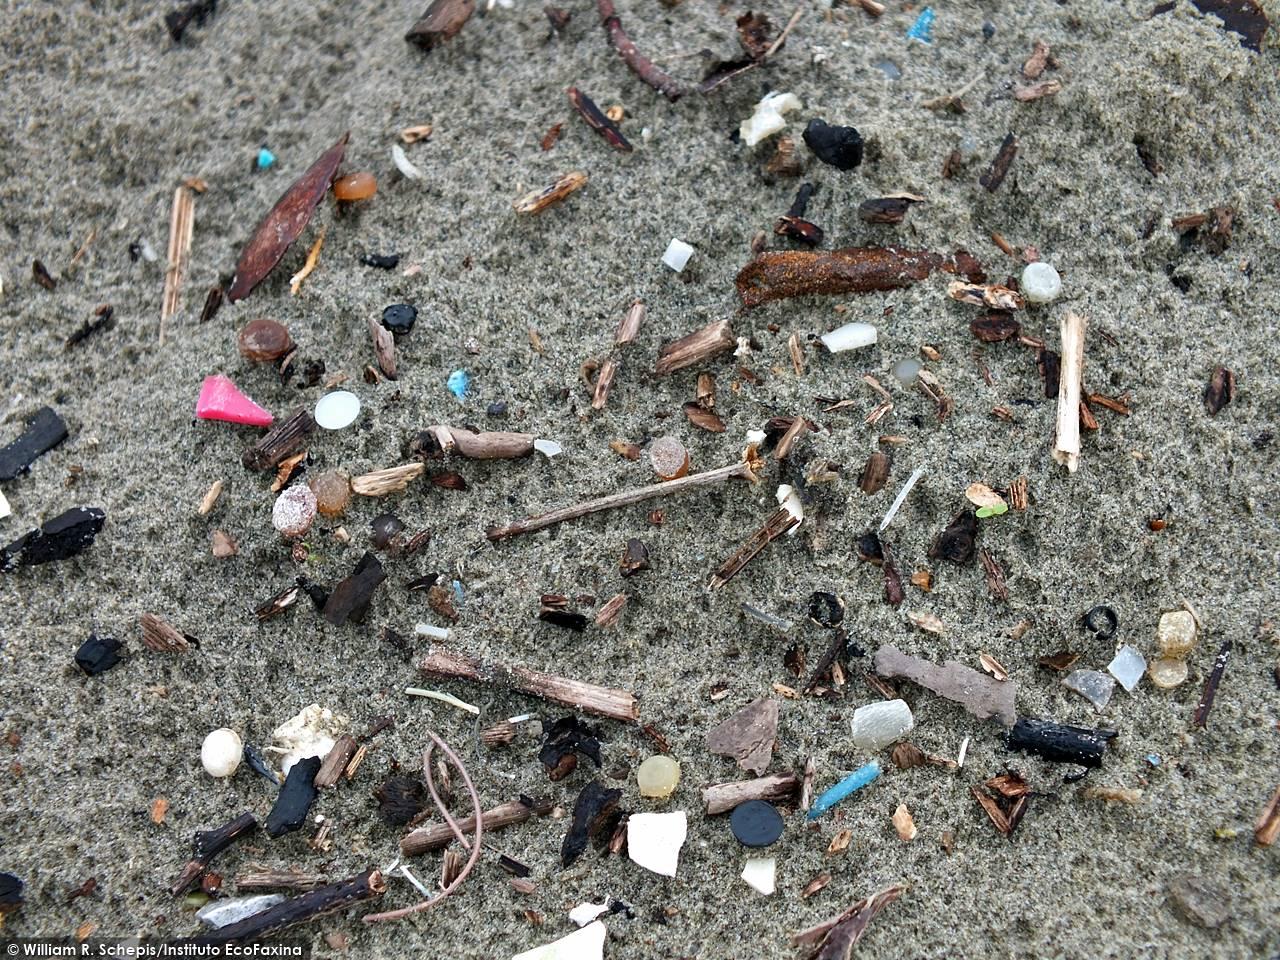 Areia repleta de microplástico na praia do Gonzaga, em Santos. Crédito: William R. Schepis/Instituto EcoFaxina